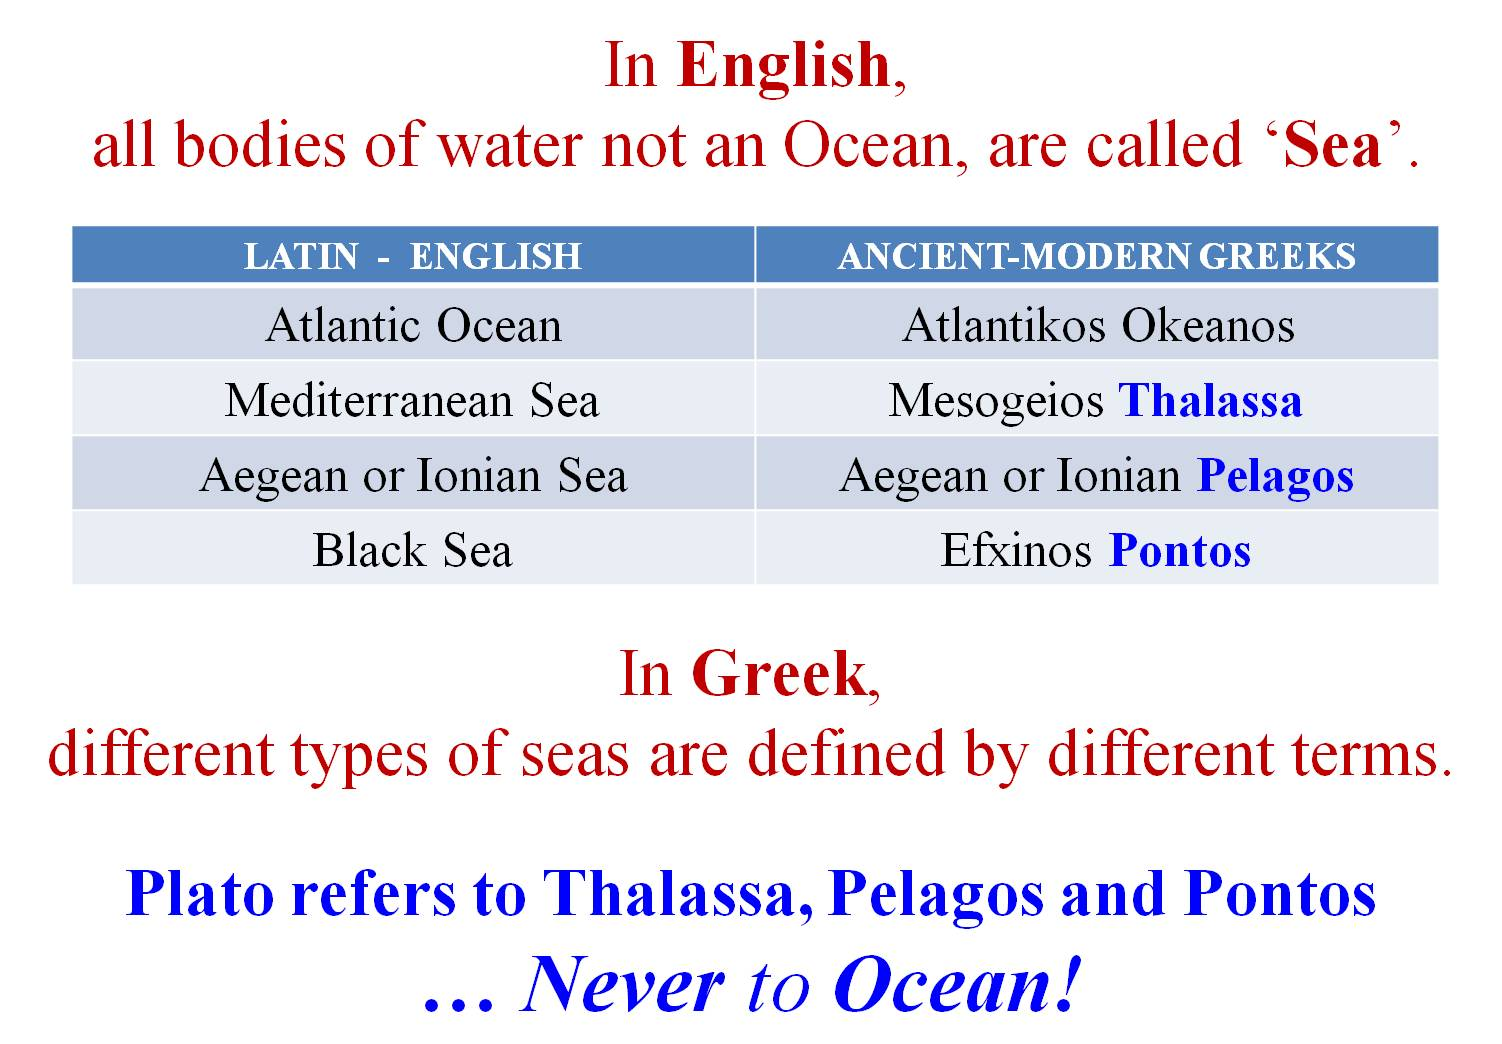 OCEAN-PELAGOS-THALASSA-PONTOS